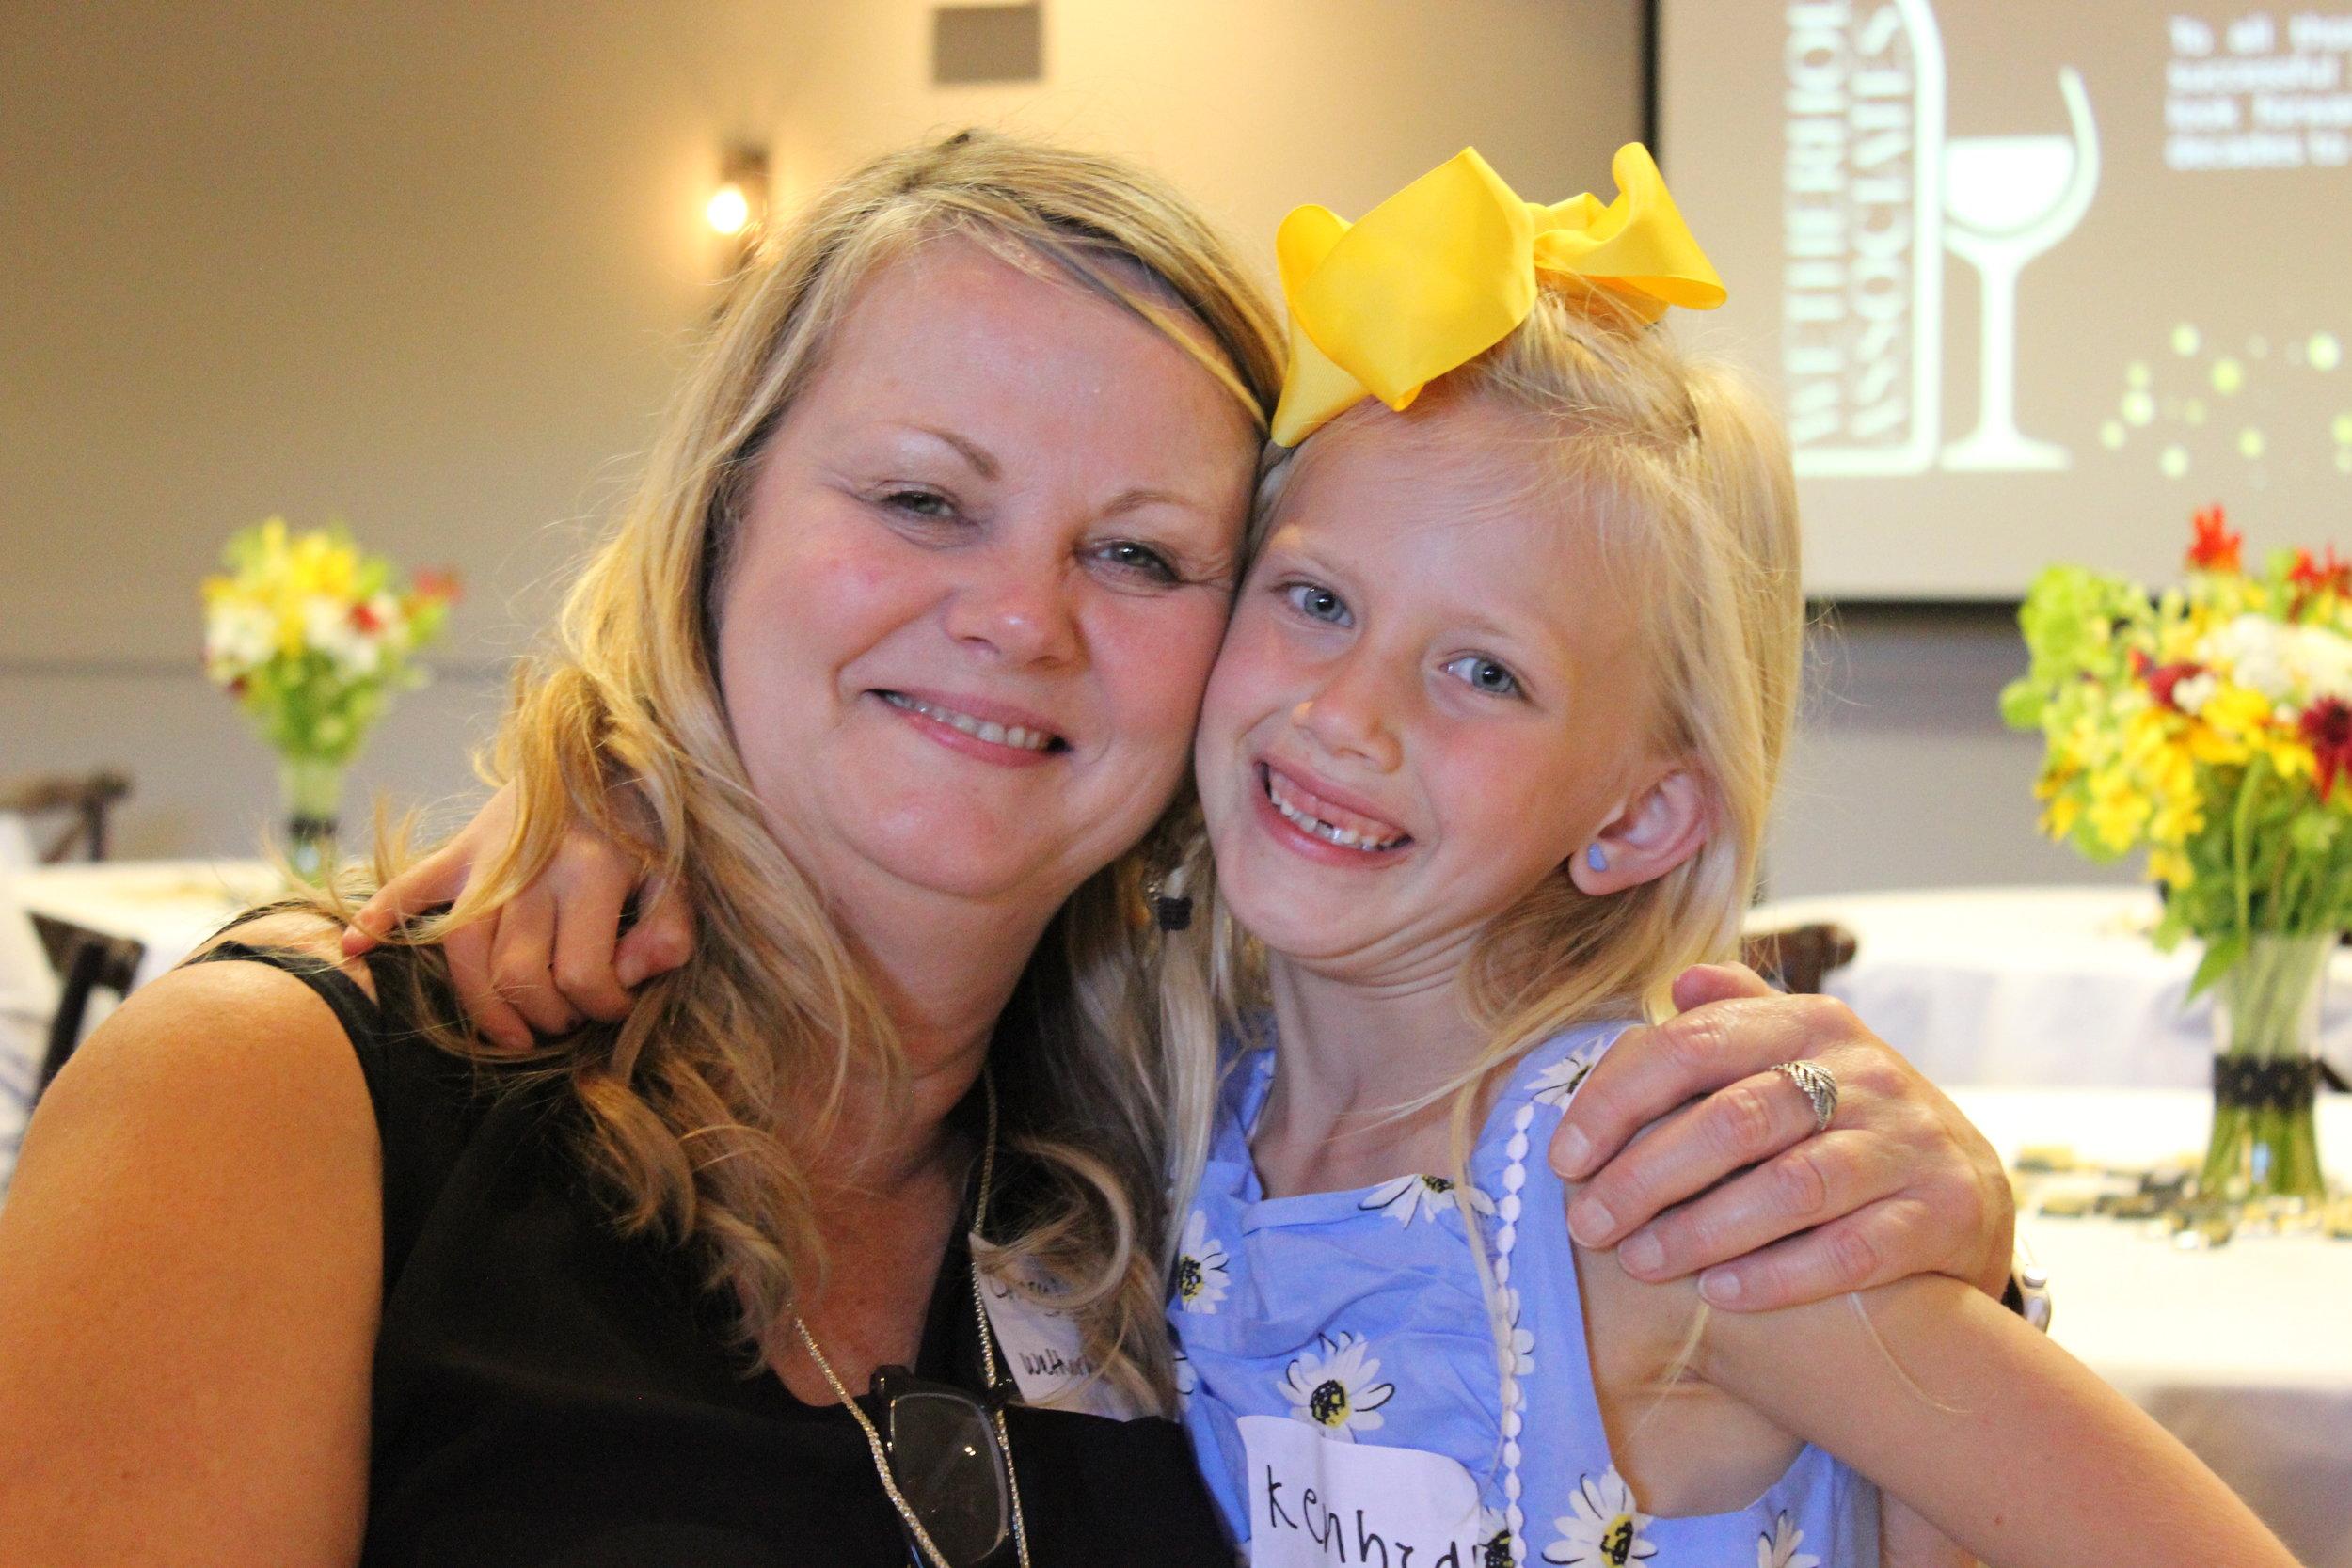 Wetherholt Billing Manager, Cheryl Olson, and her granddaughter, Kennedy